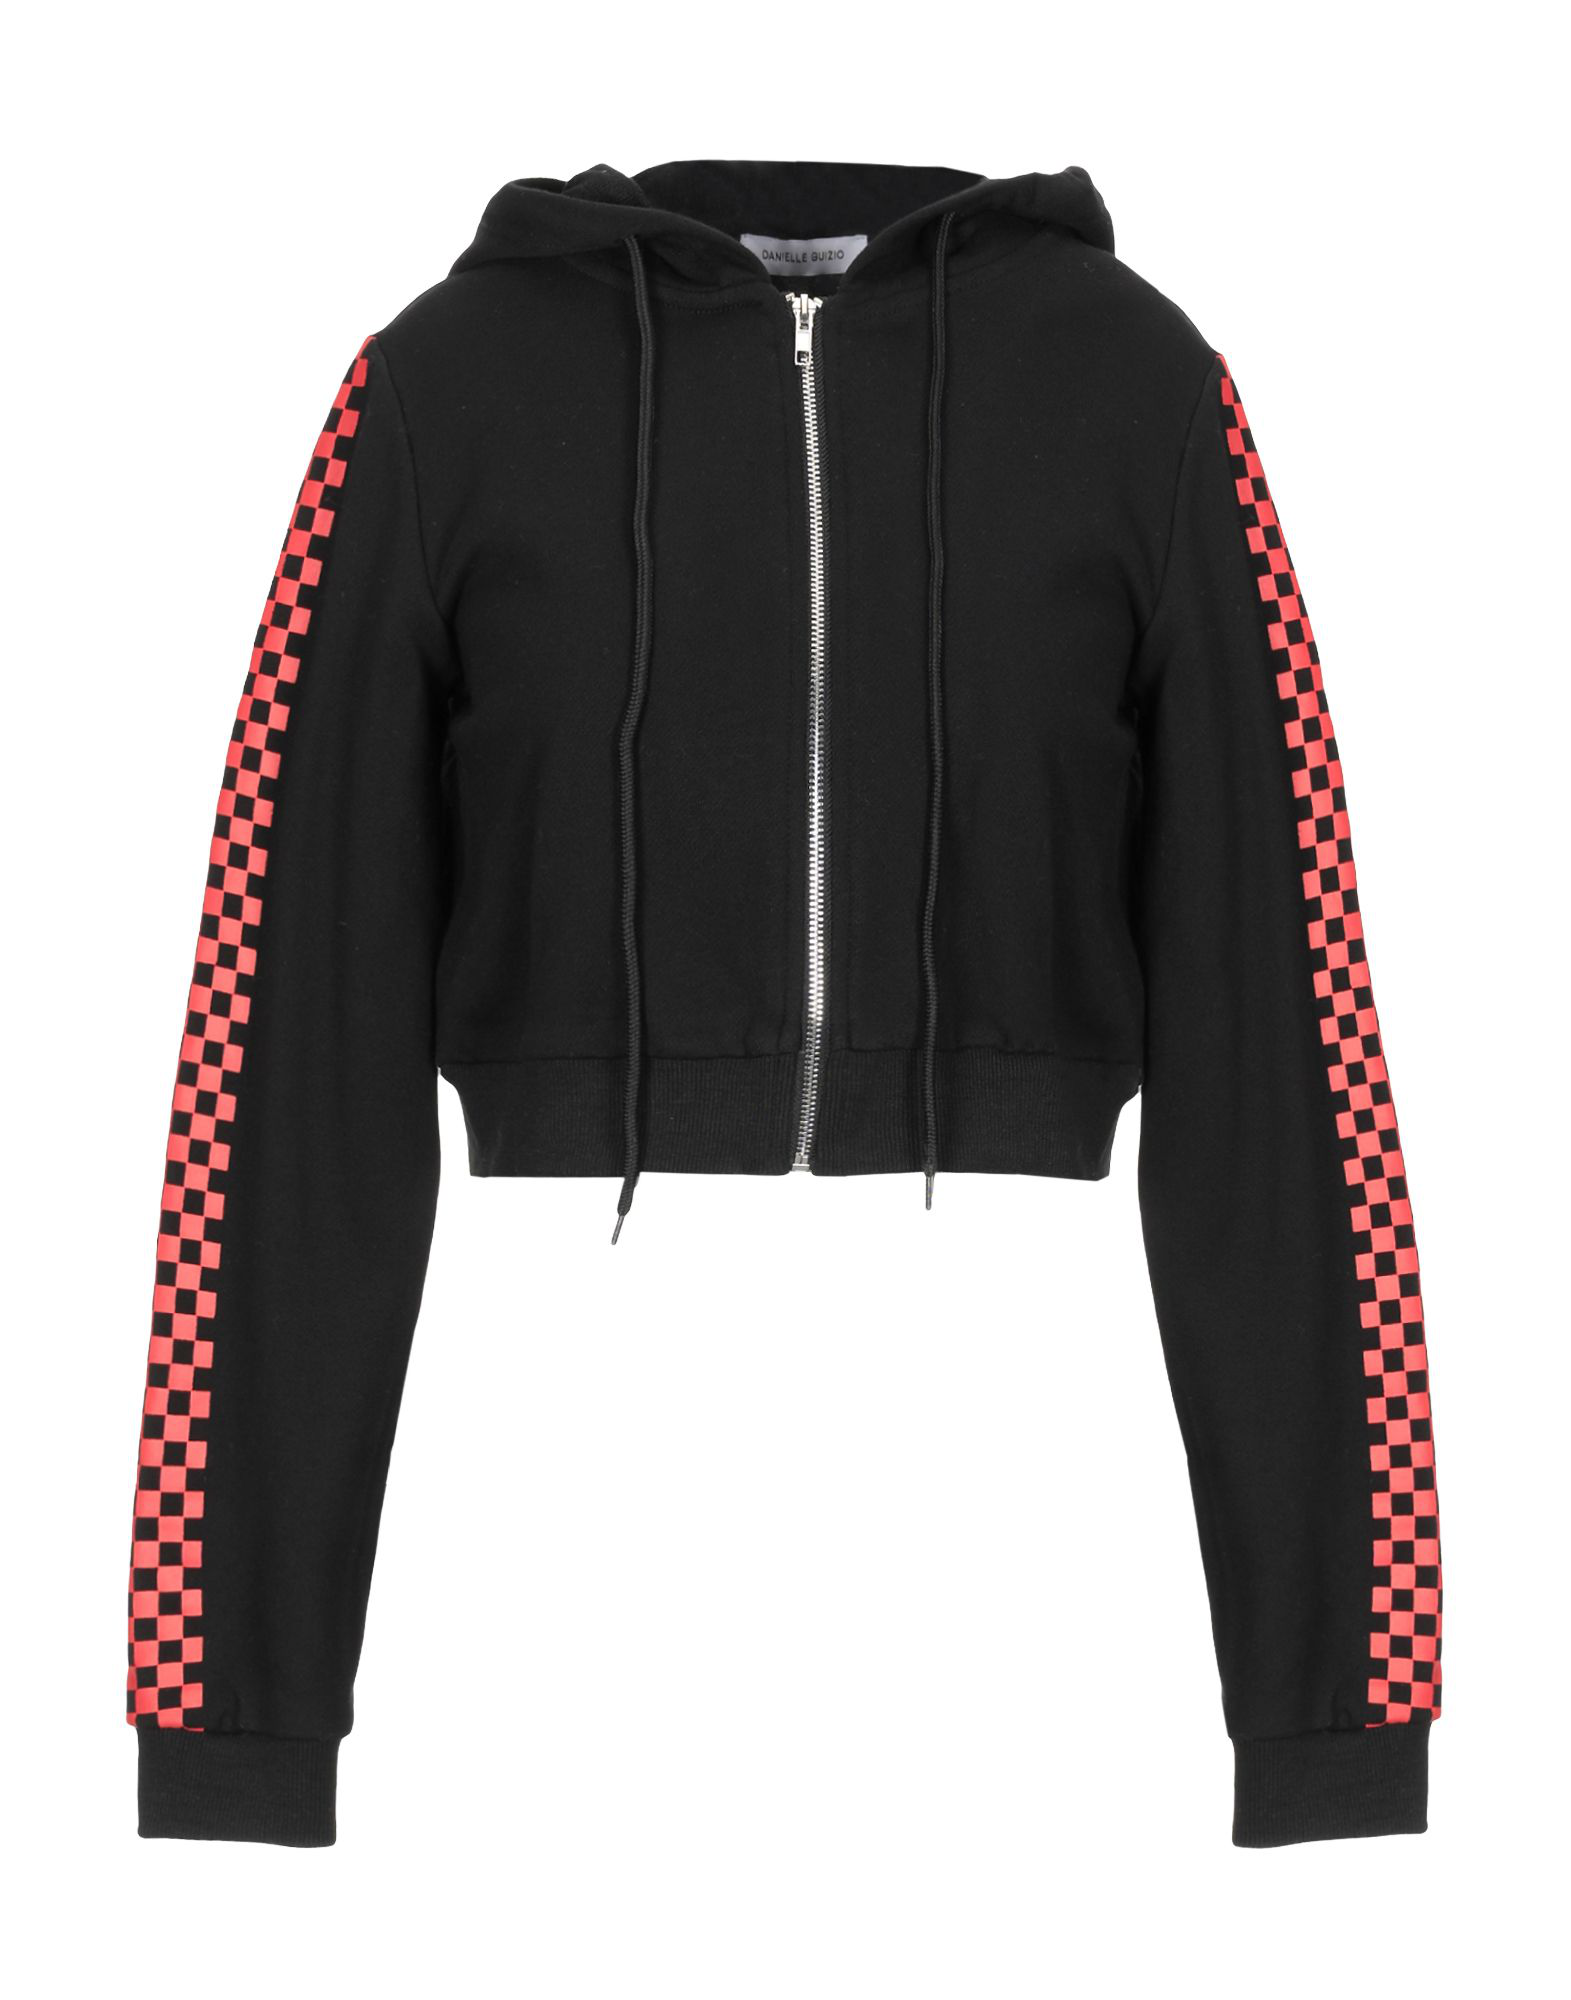 037a90bba0 Danielle Guizio Sweatshirts In Black